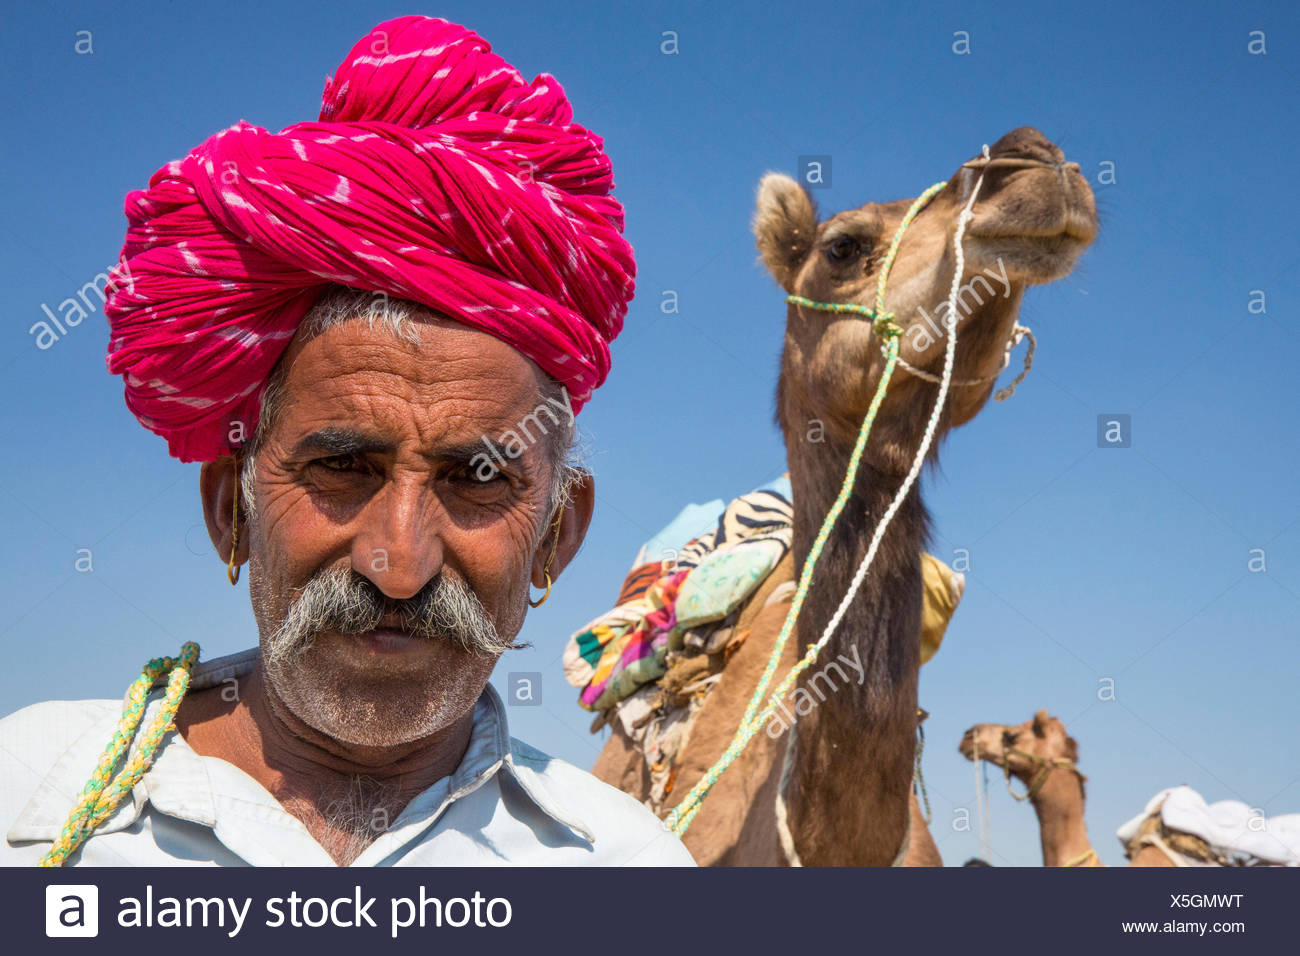 Camel driver, camel, Asia, India, man, turban, camel, dromedary, Rajasthan, - Stock Image